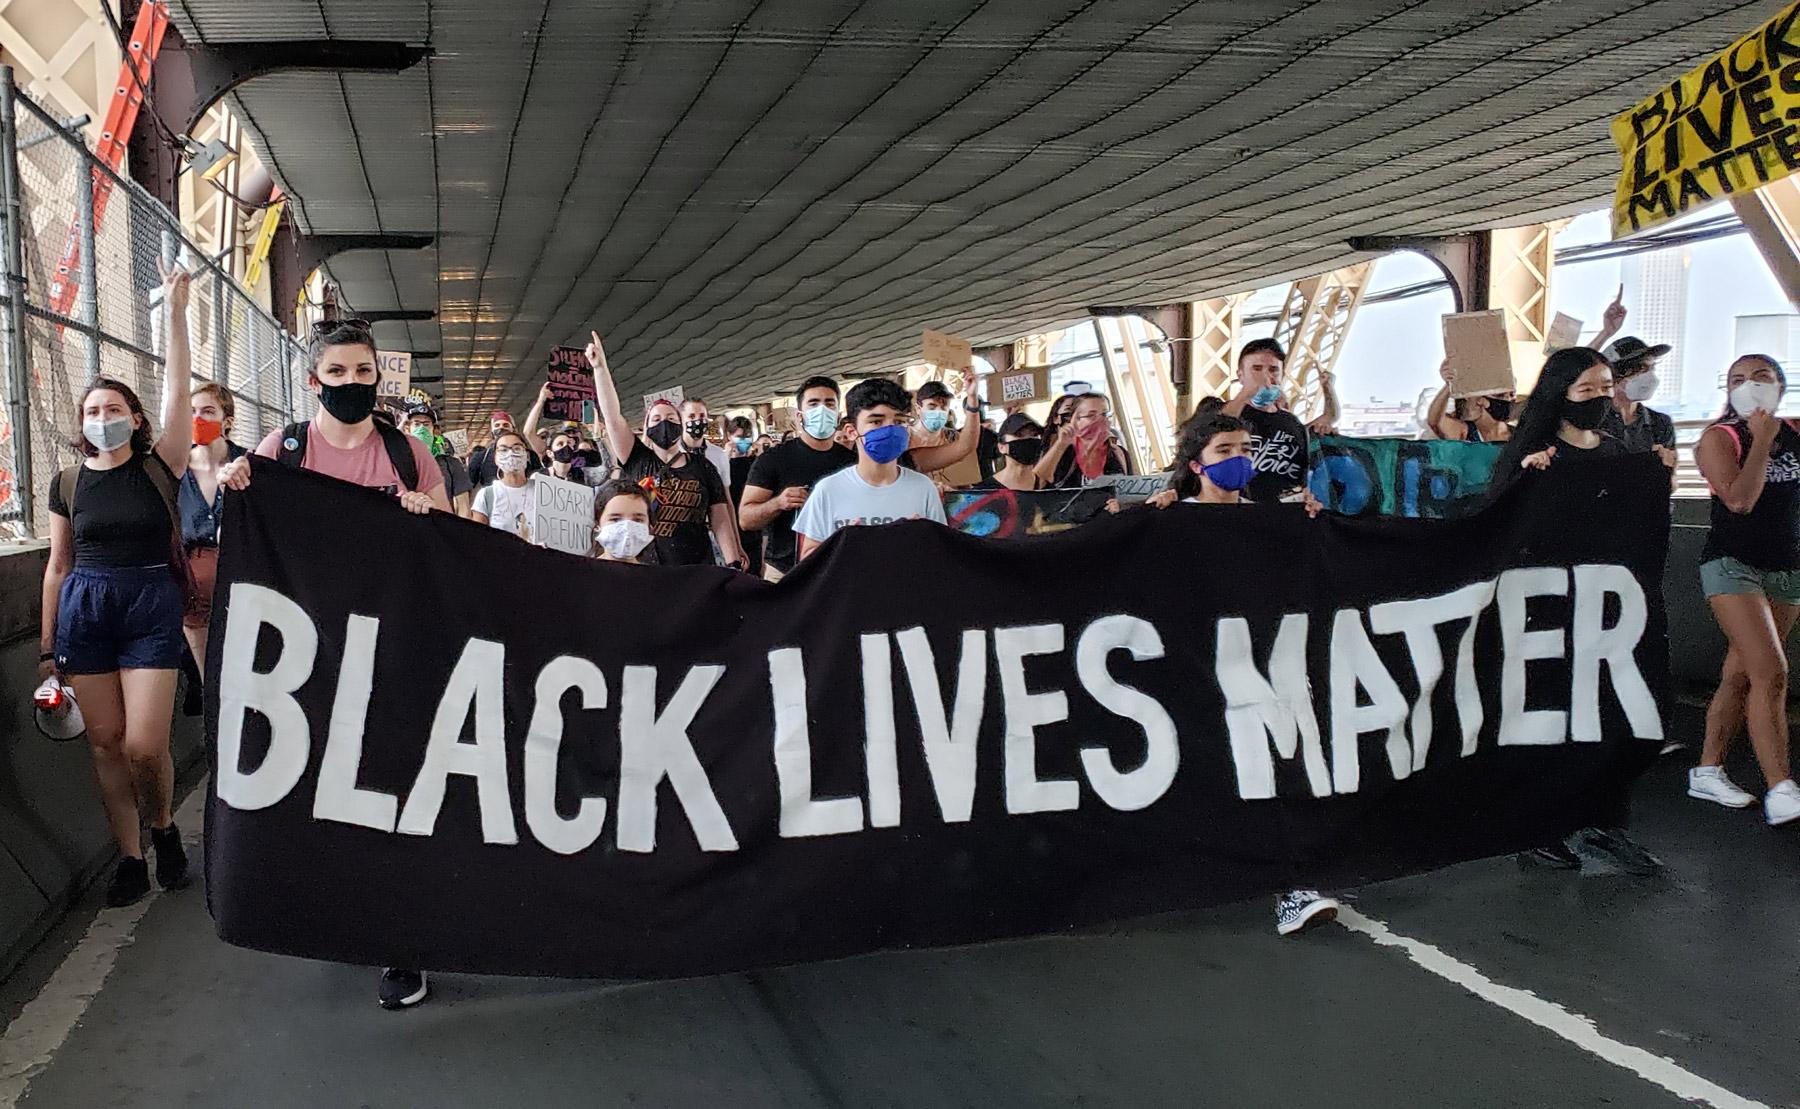 Aleda marches in a Black LIves Matter march across the Queensboro Bridge